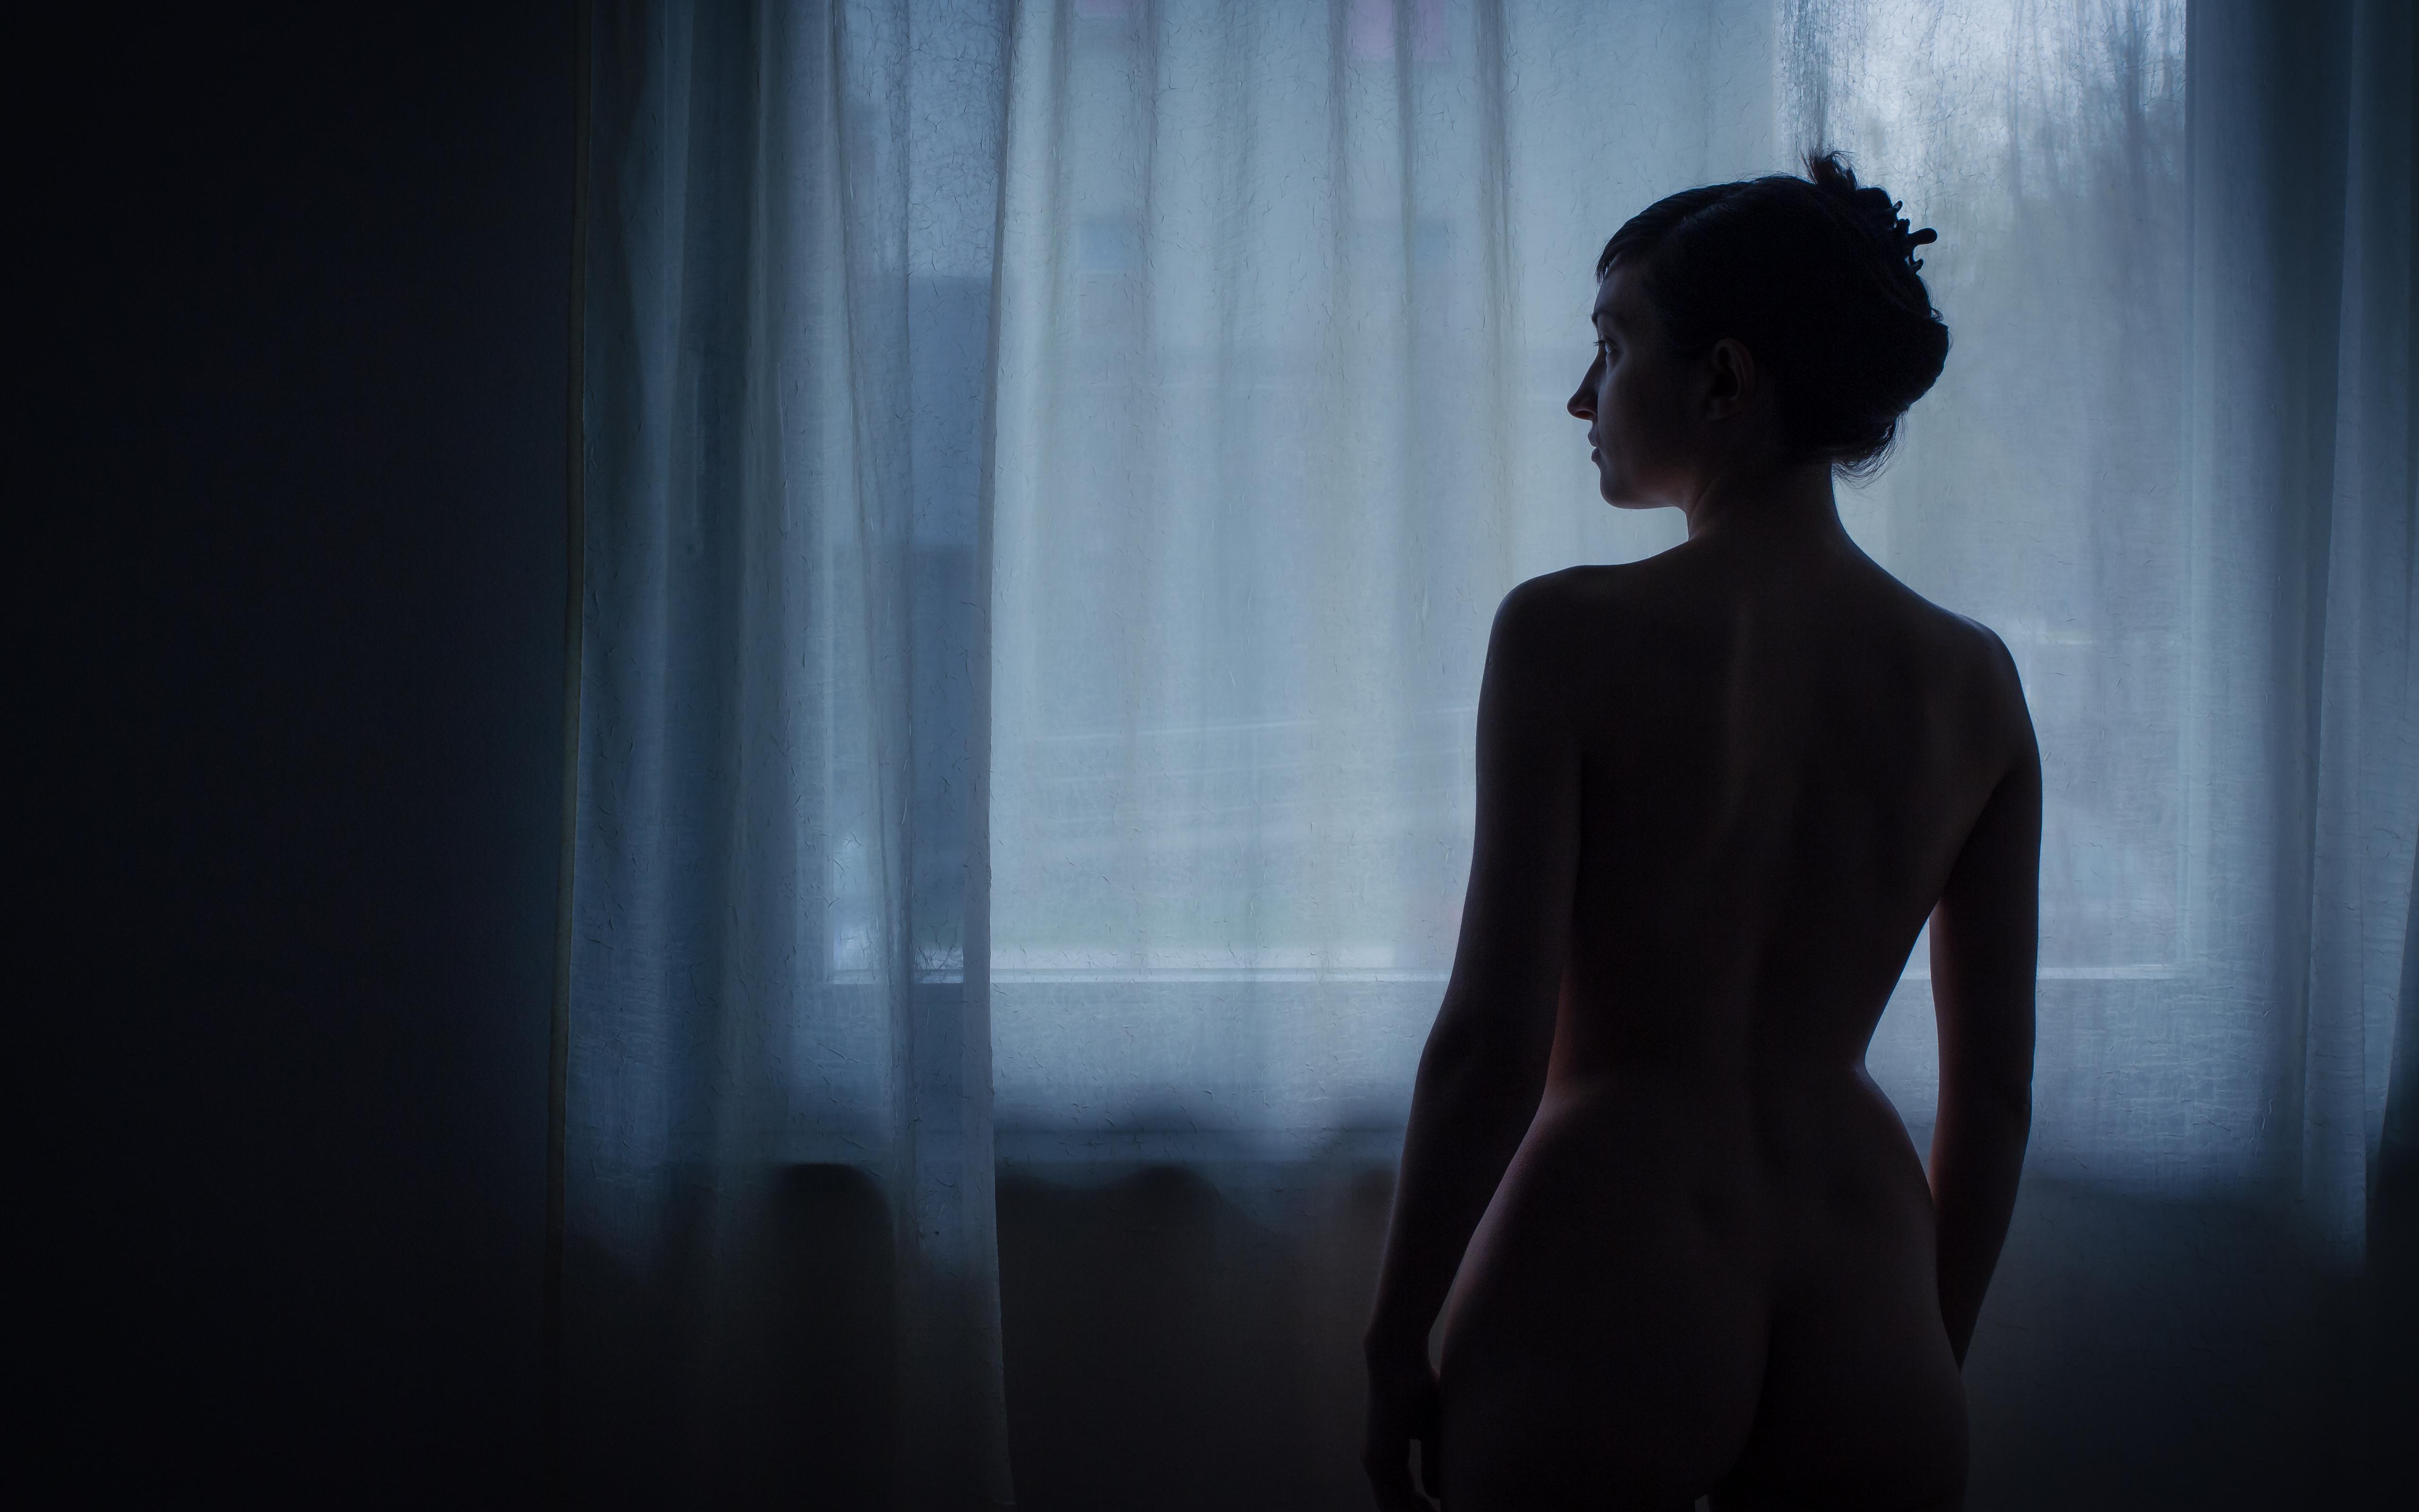 Fondos de pantalla : Mañana, azul, sombra, mujer, autorretrato, yo ...